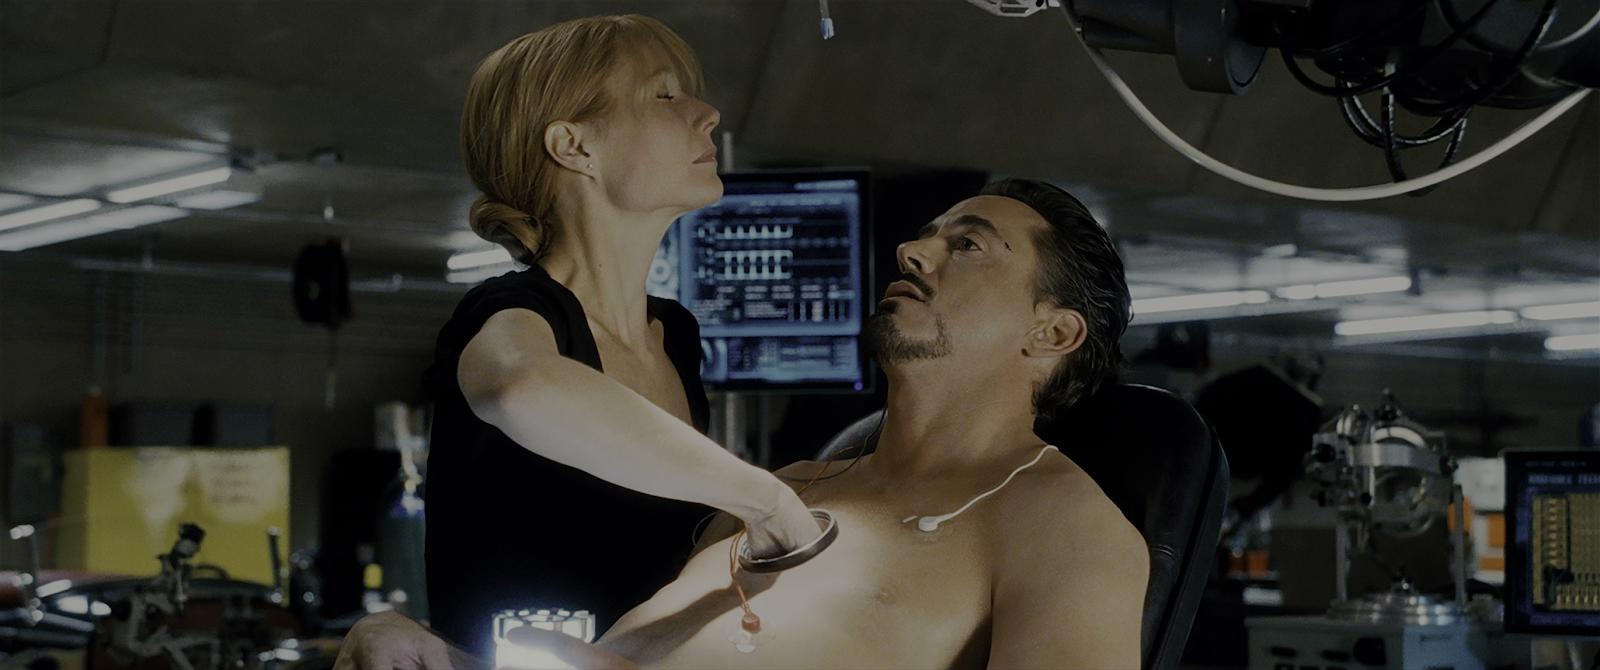 Iron Man: el Hombre de Hierro (2008) 4K UHD [HDR] Latino - Ingles captura 3